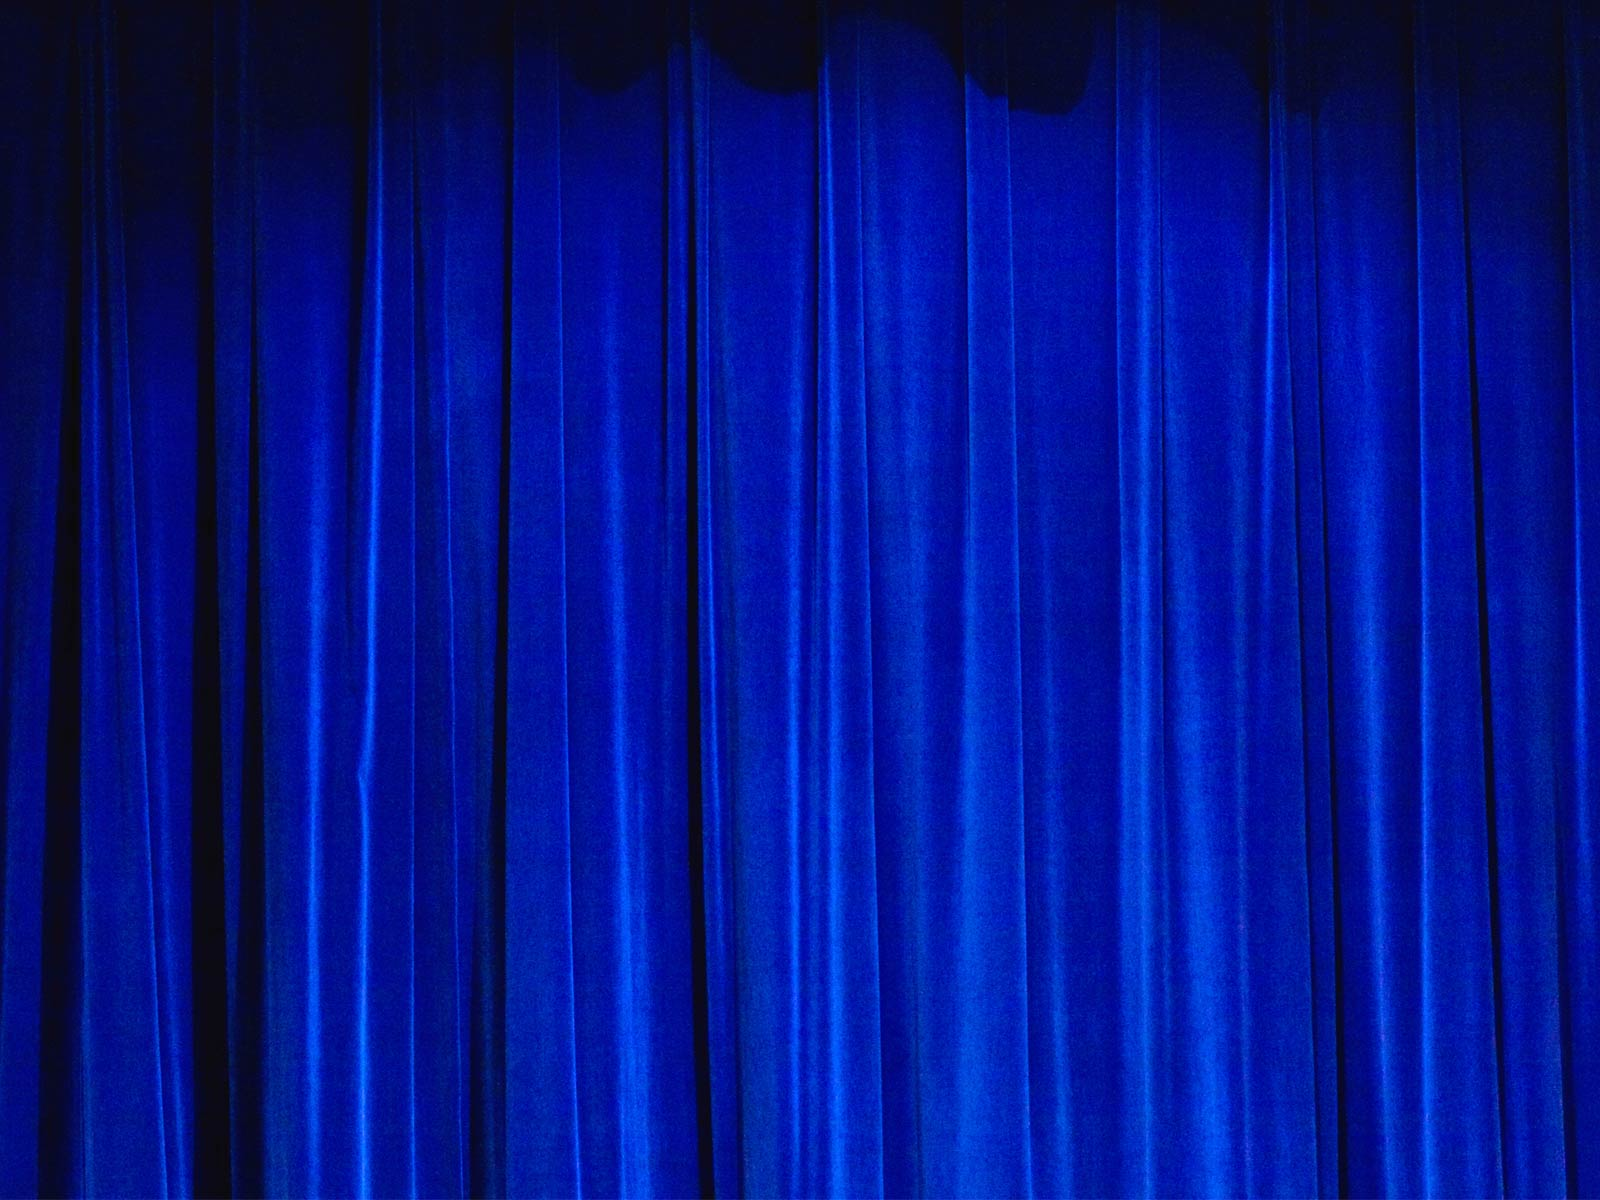 Vorhang Blau Simple Vorhang Blaugold Gesteift In Coburg